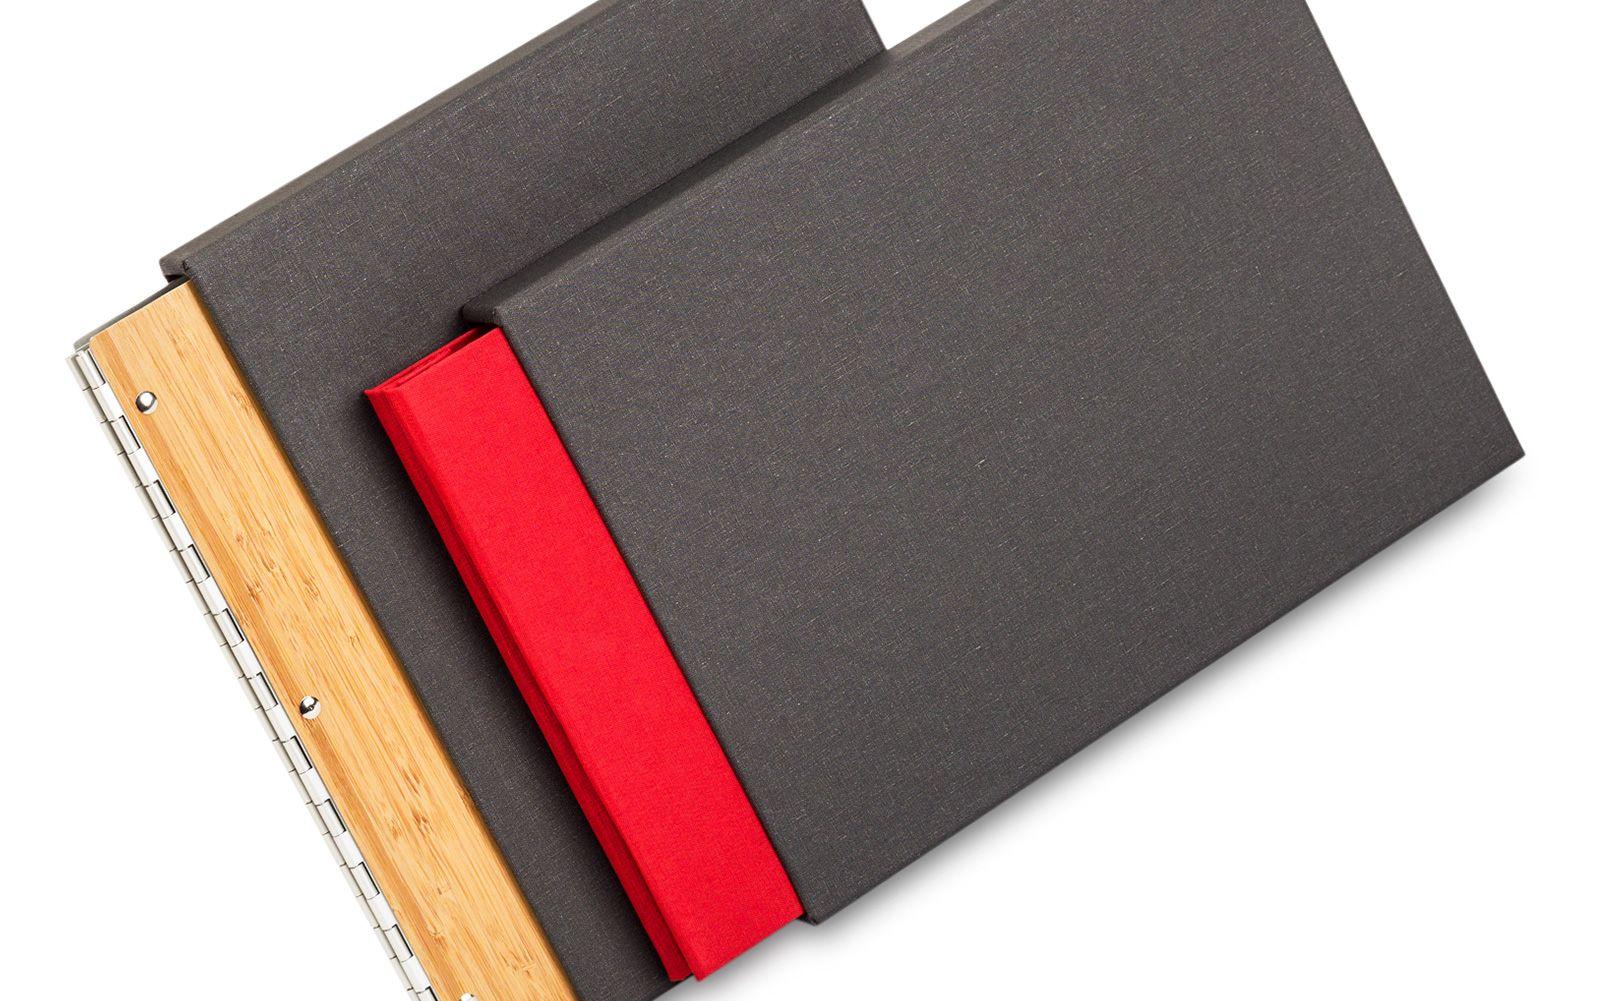 Portfolio Supplies Pina Zangaro Cases and Covers for